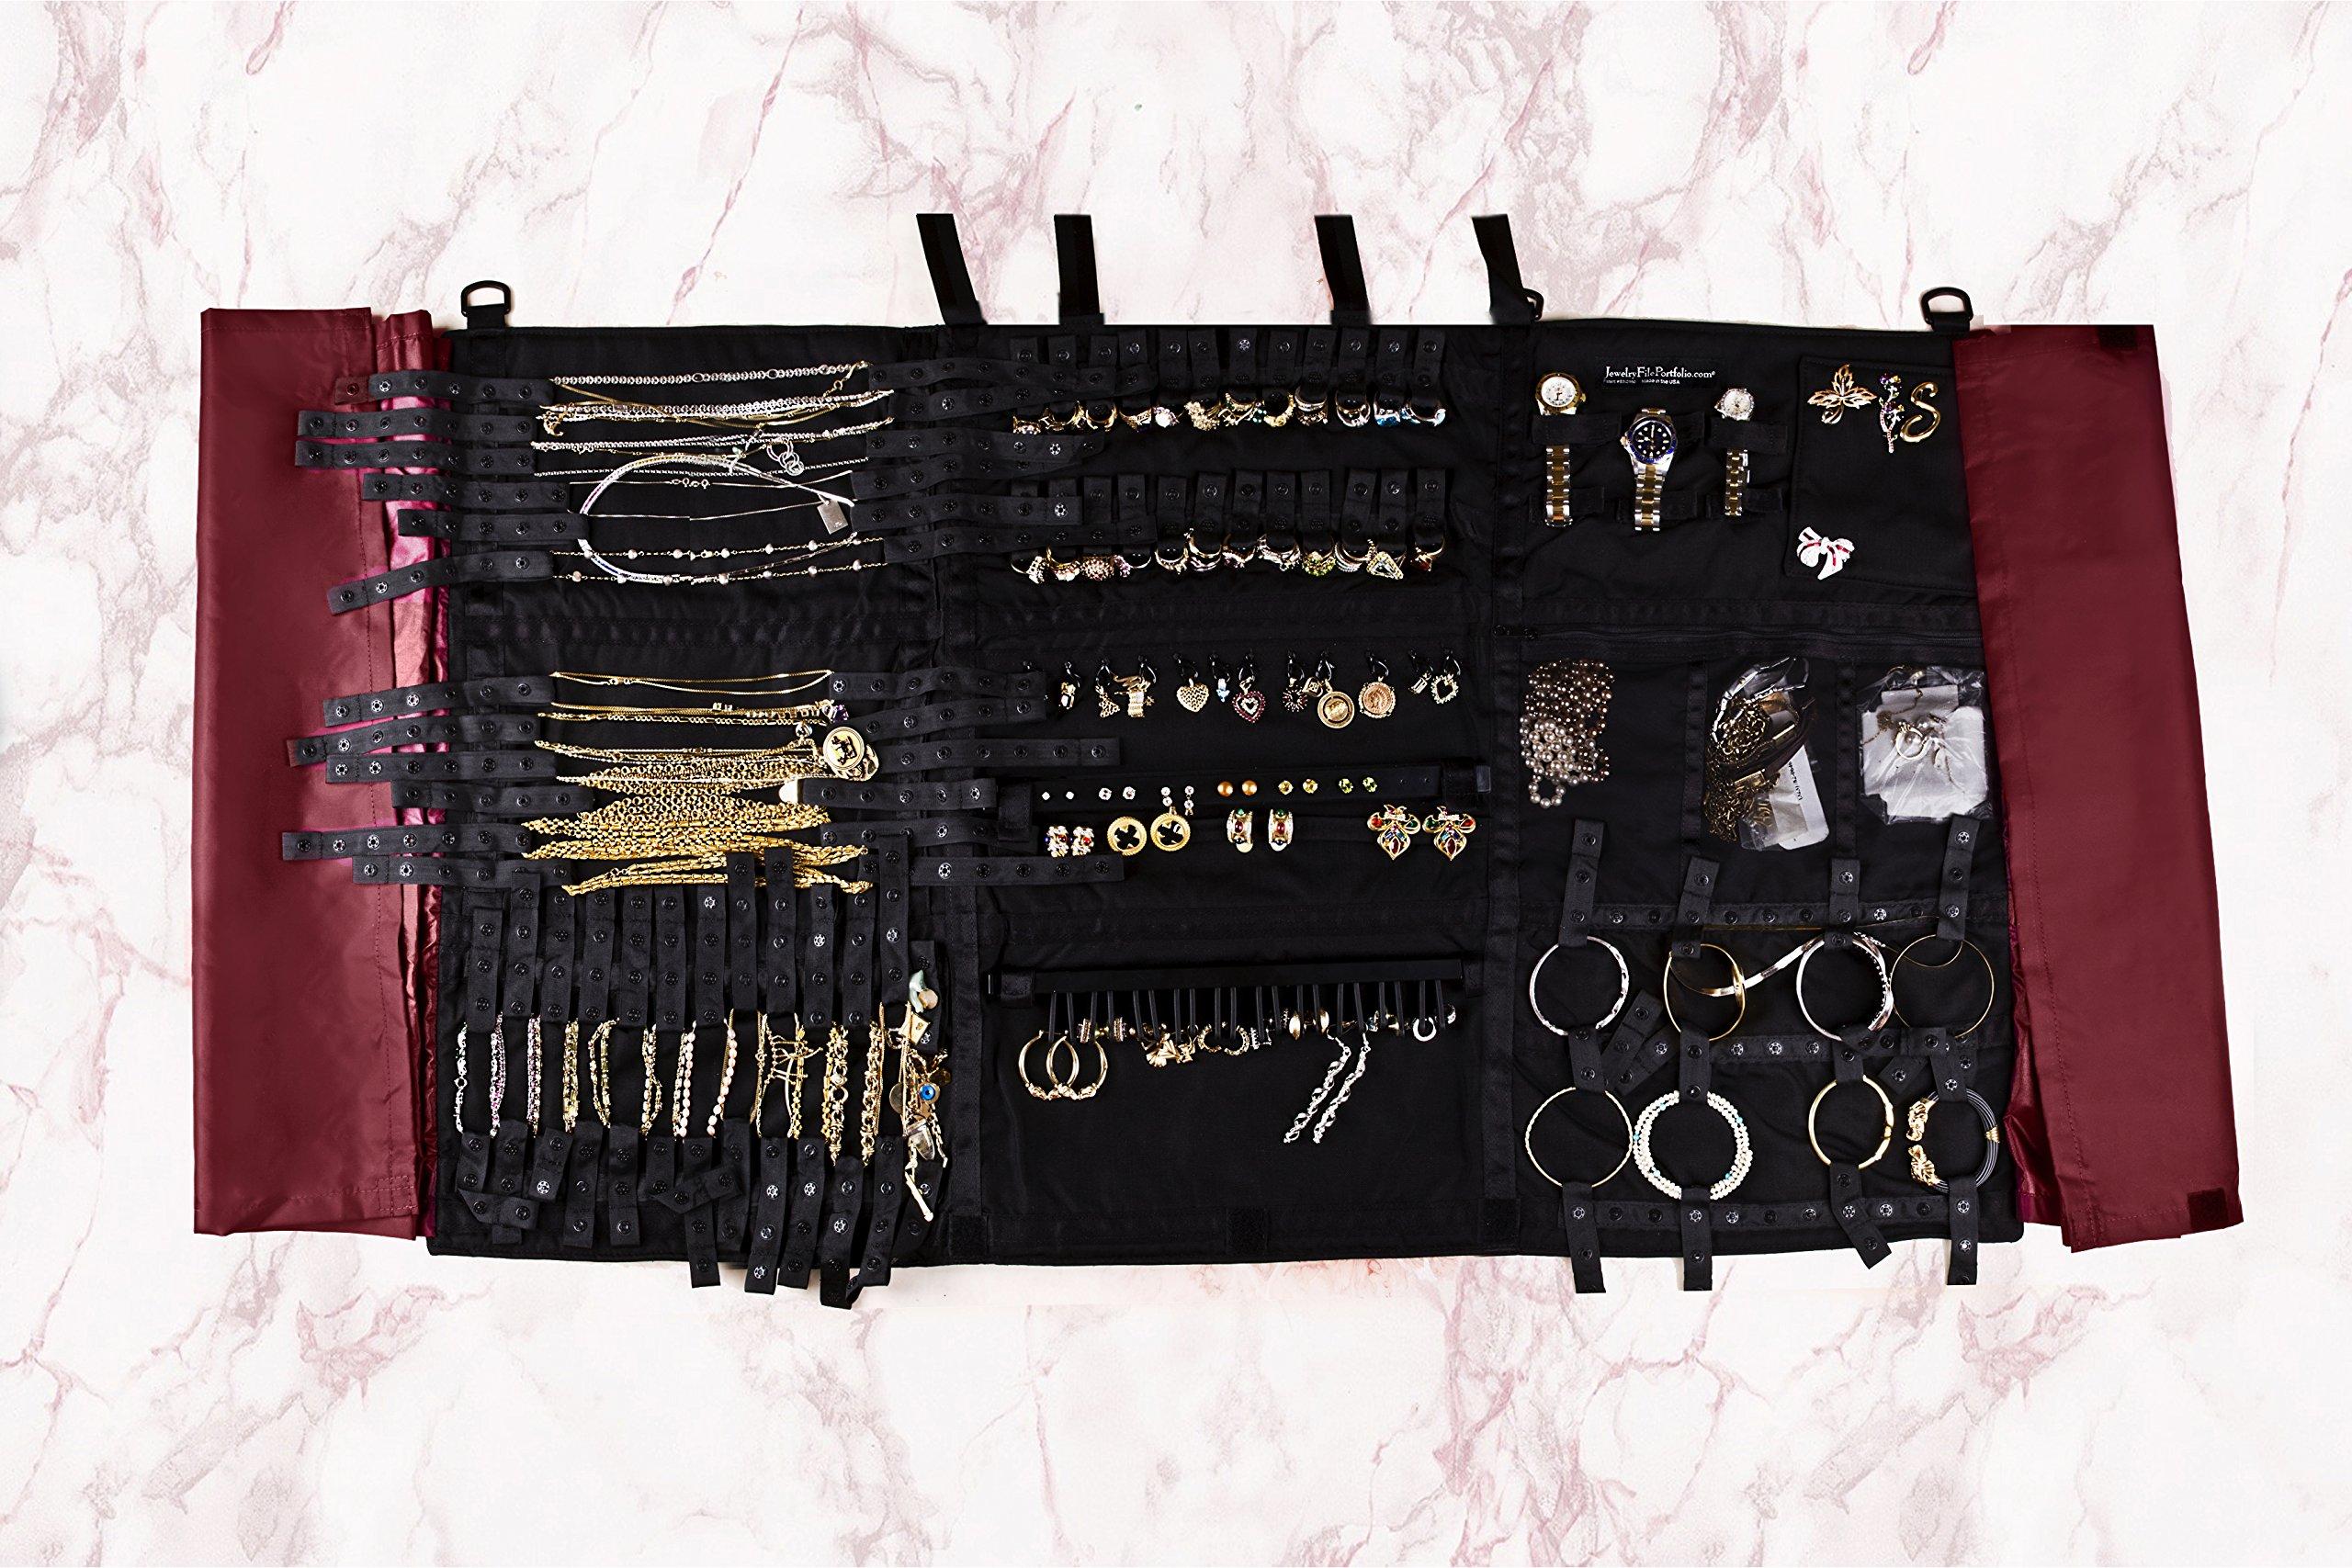 Folding Foldable Storage Case Jewelry Organizer by Jewelry File Portfolio 21 Century Holds over 117 pieces Securely by JewelryFilePortfolio organizer (Image #7)